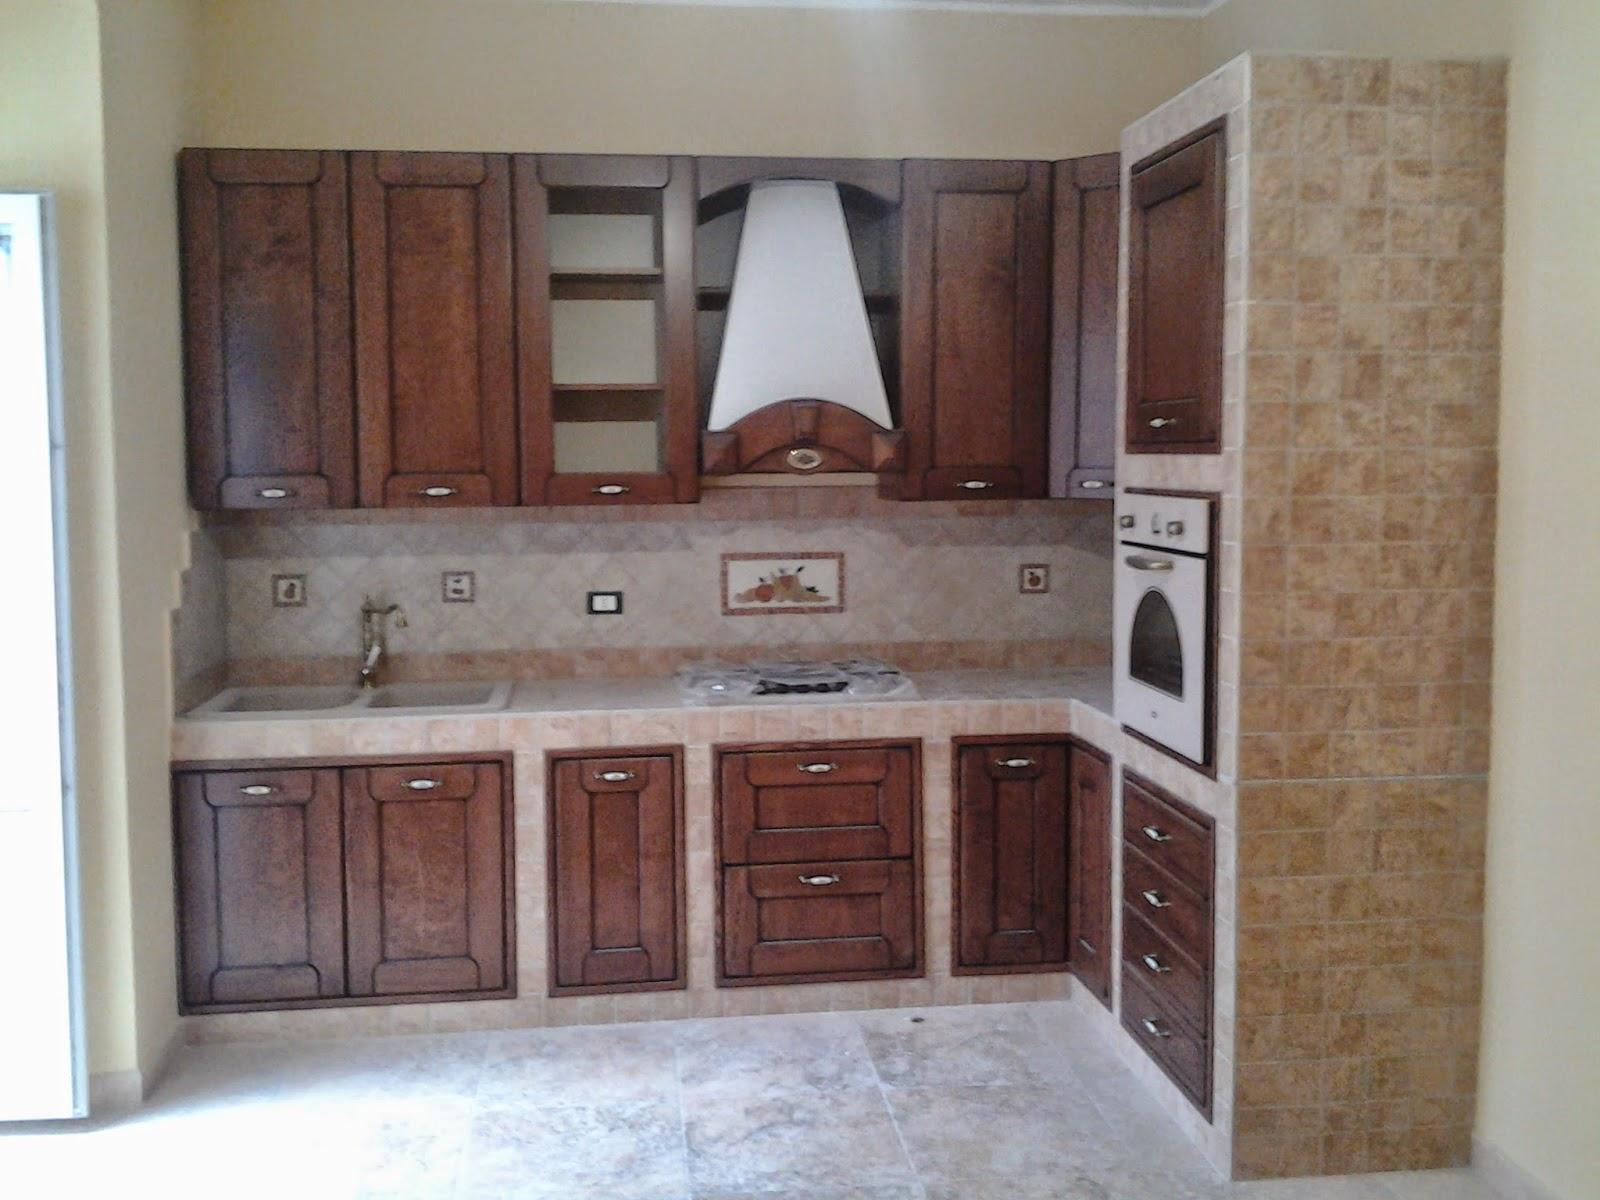 Architetto gaetano frud cucina in muratura - Cucinini in muratura ...